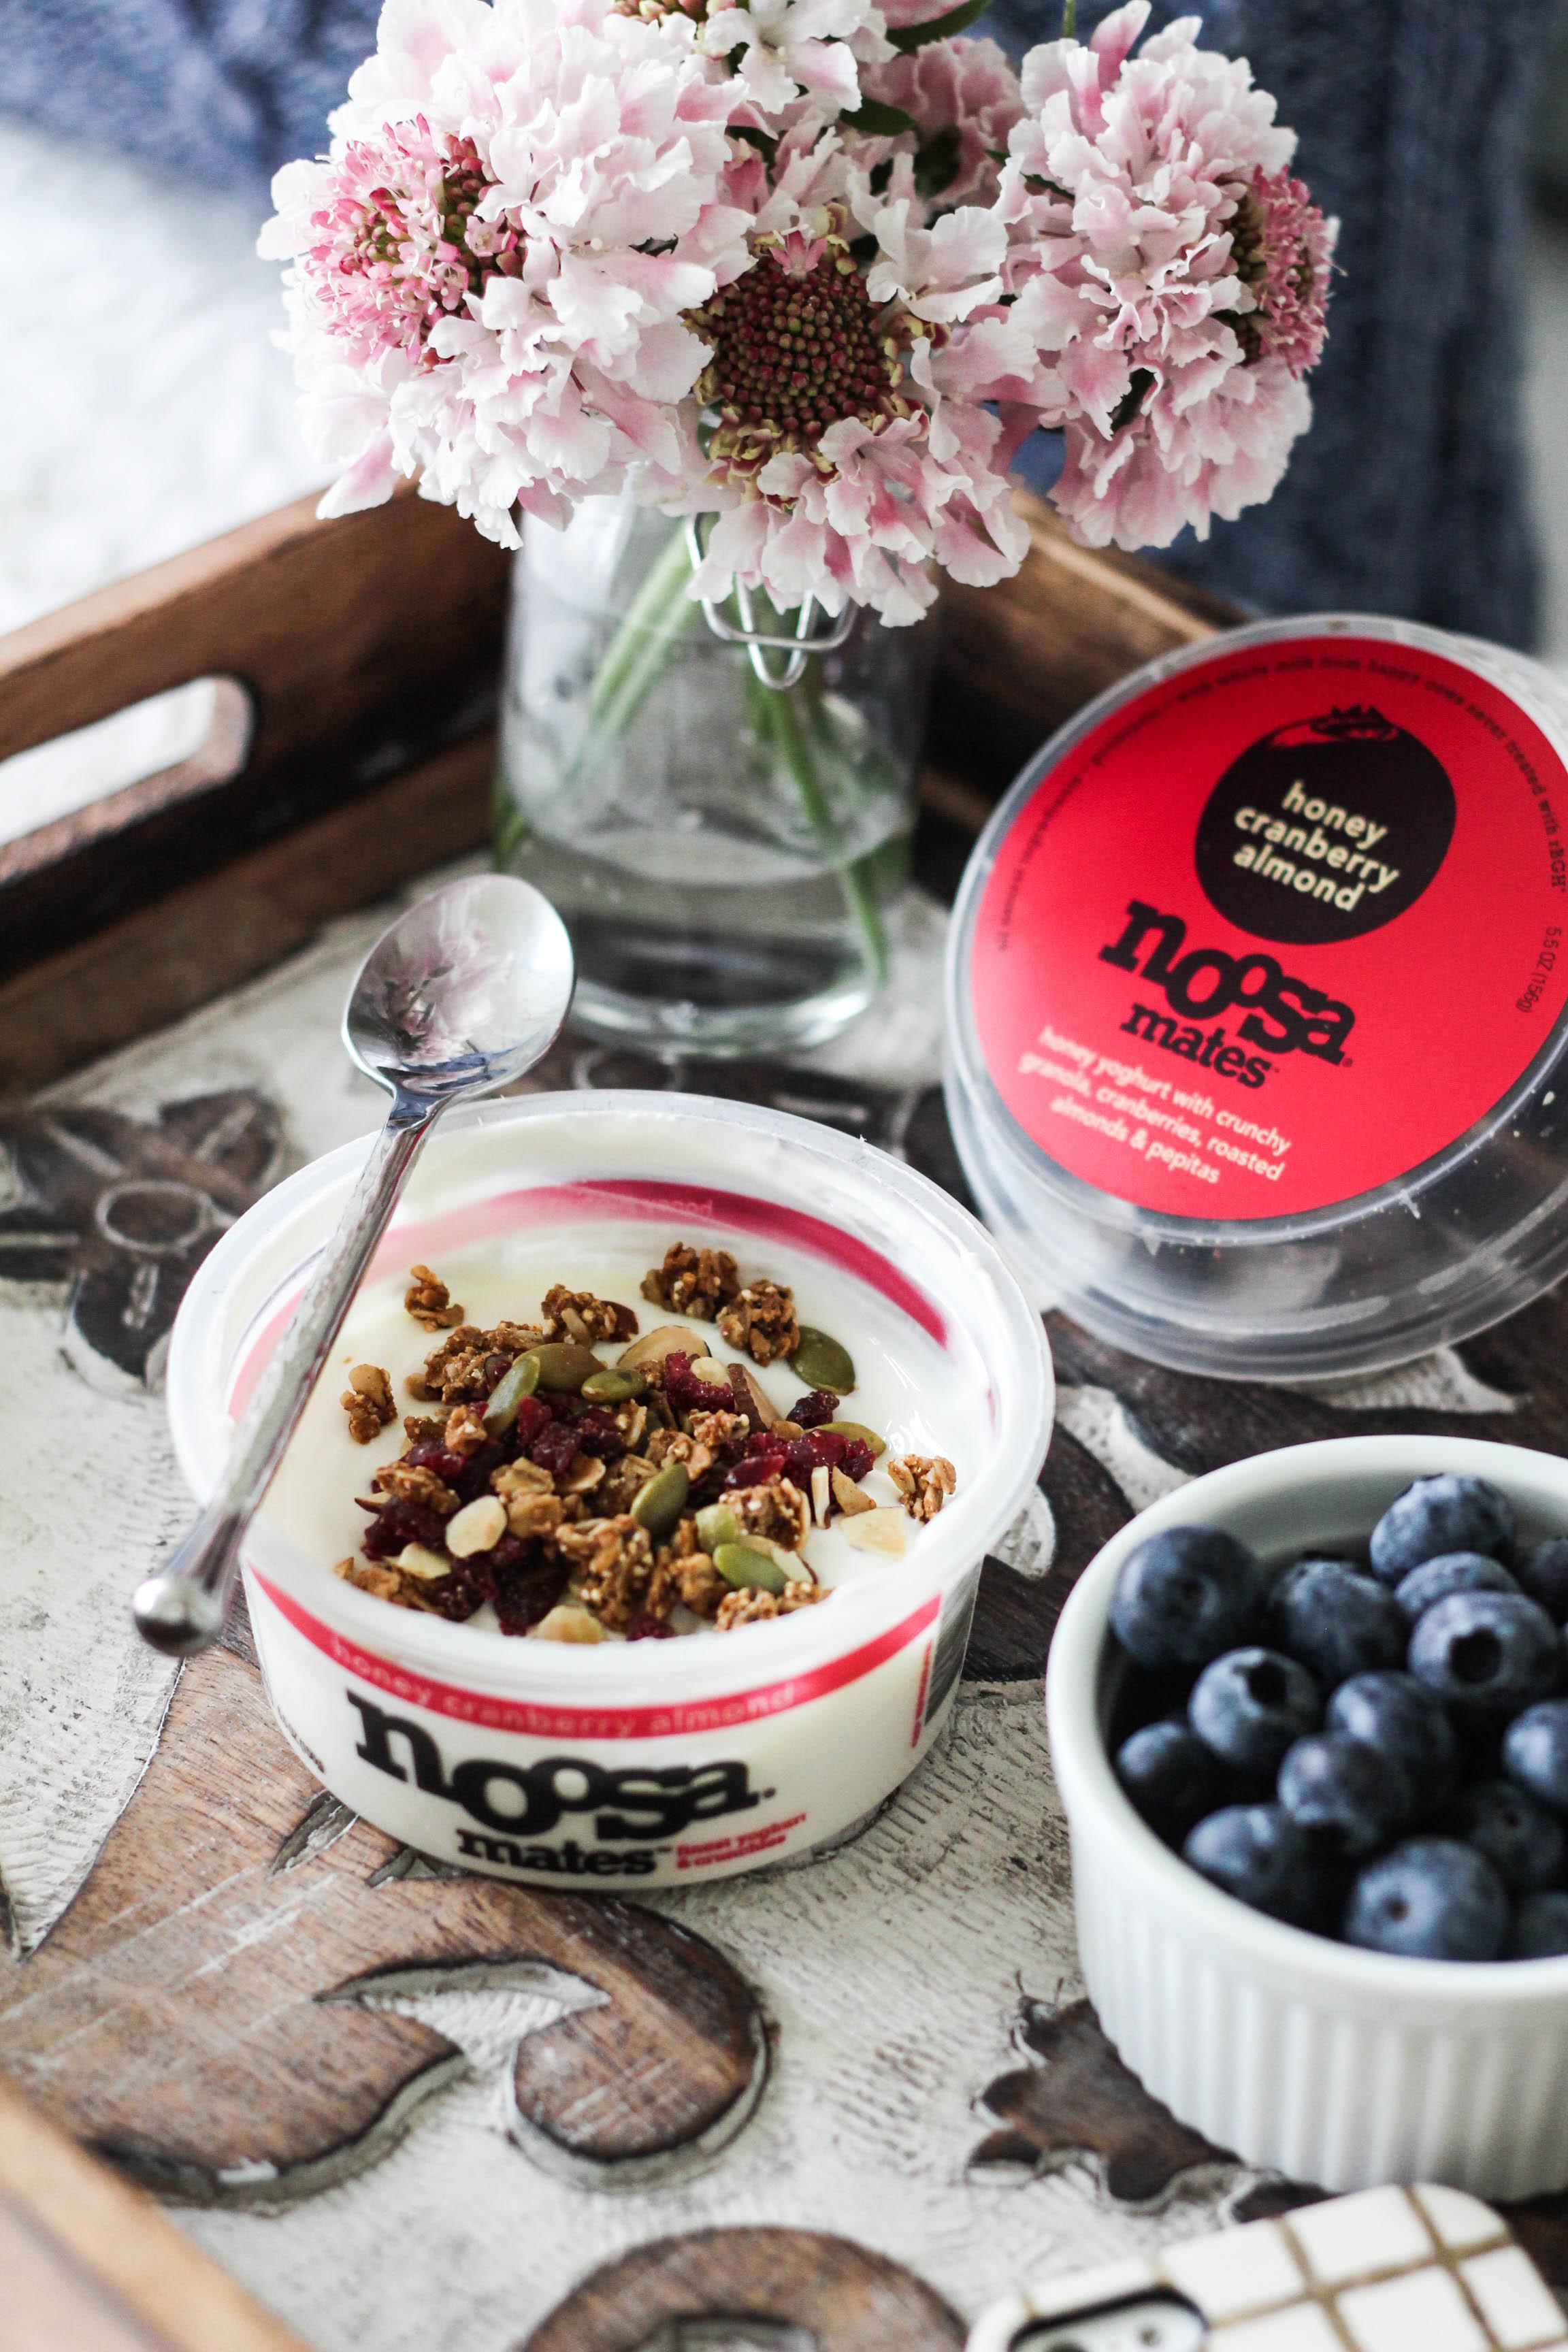 noosa mates yoghurt honey cranberry almond - Noosa Mates